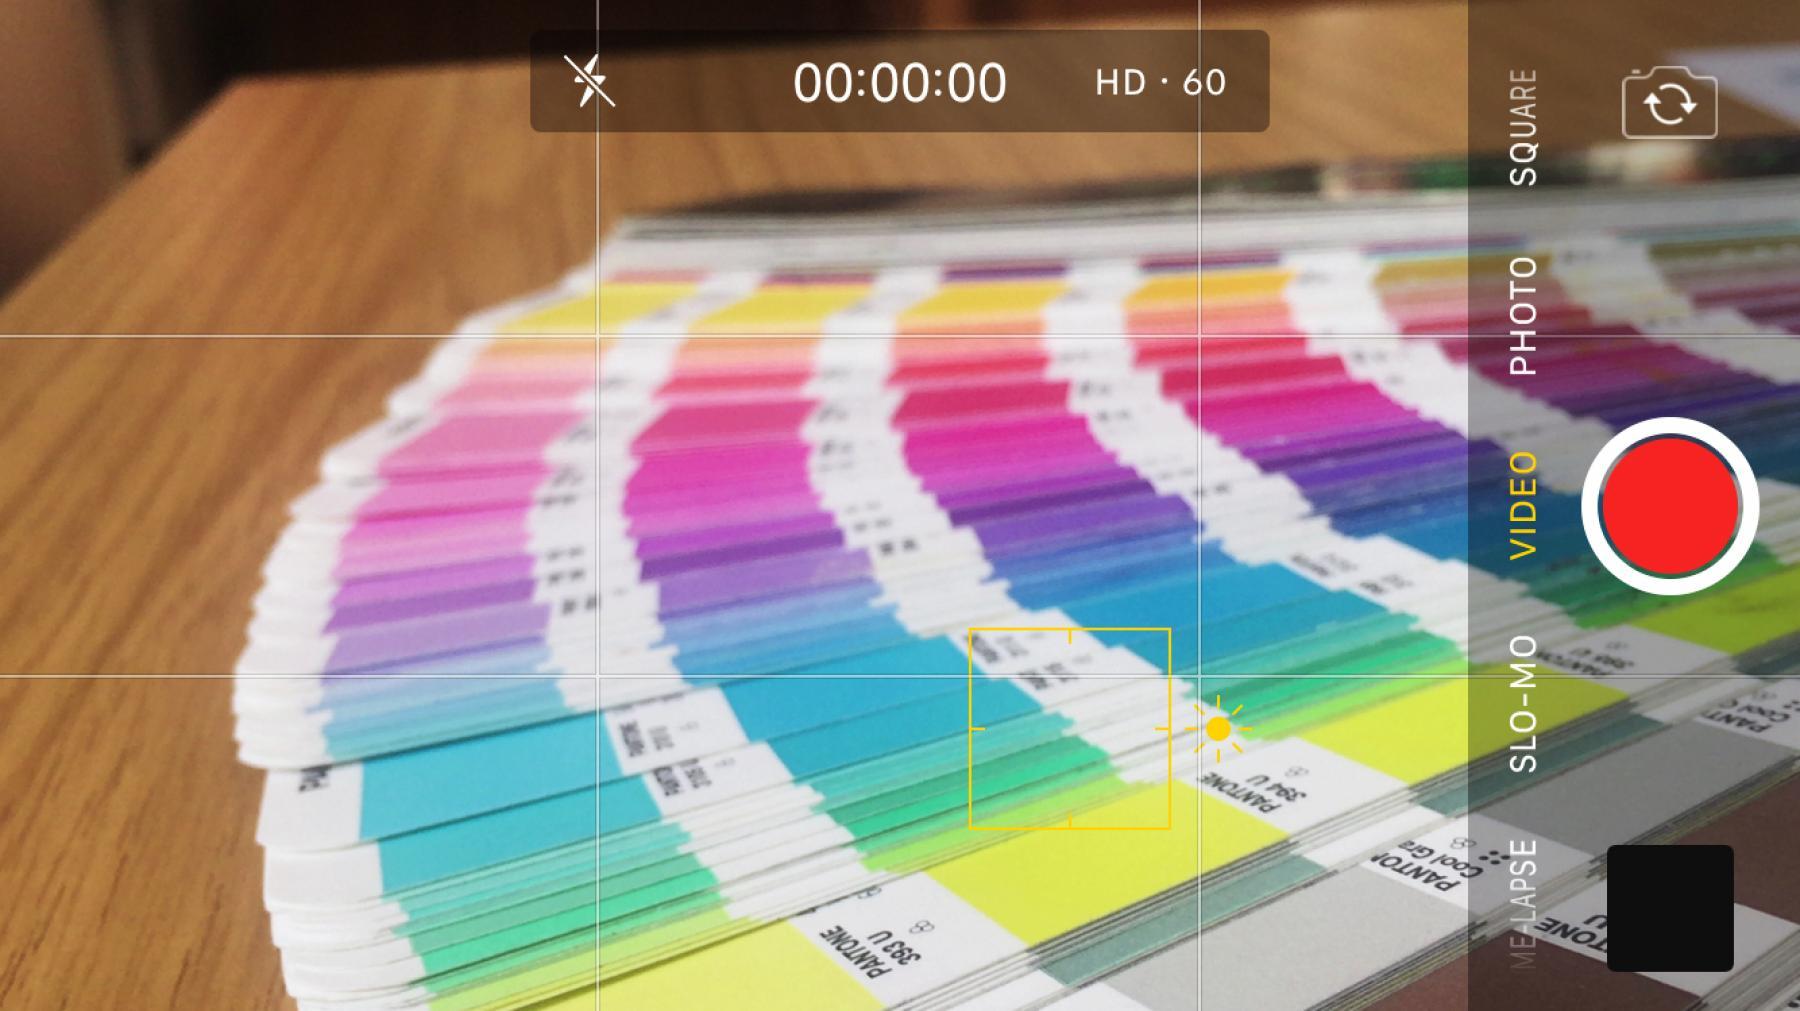 PONToon Video Editing Tutorial - Focusing a Video on an Apple iPhone